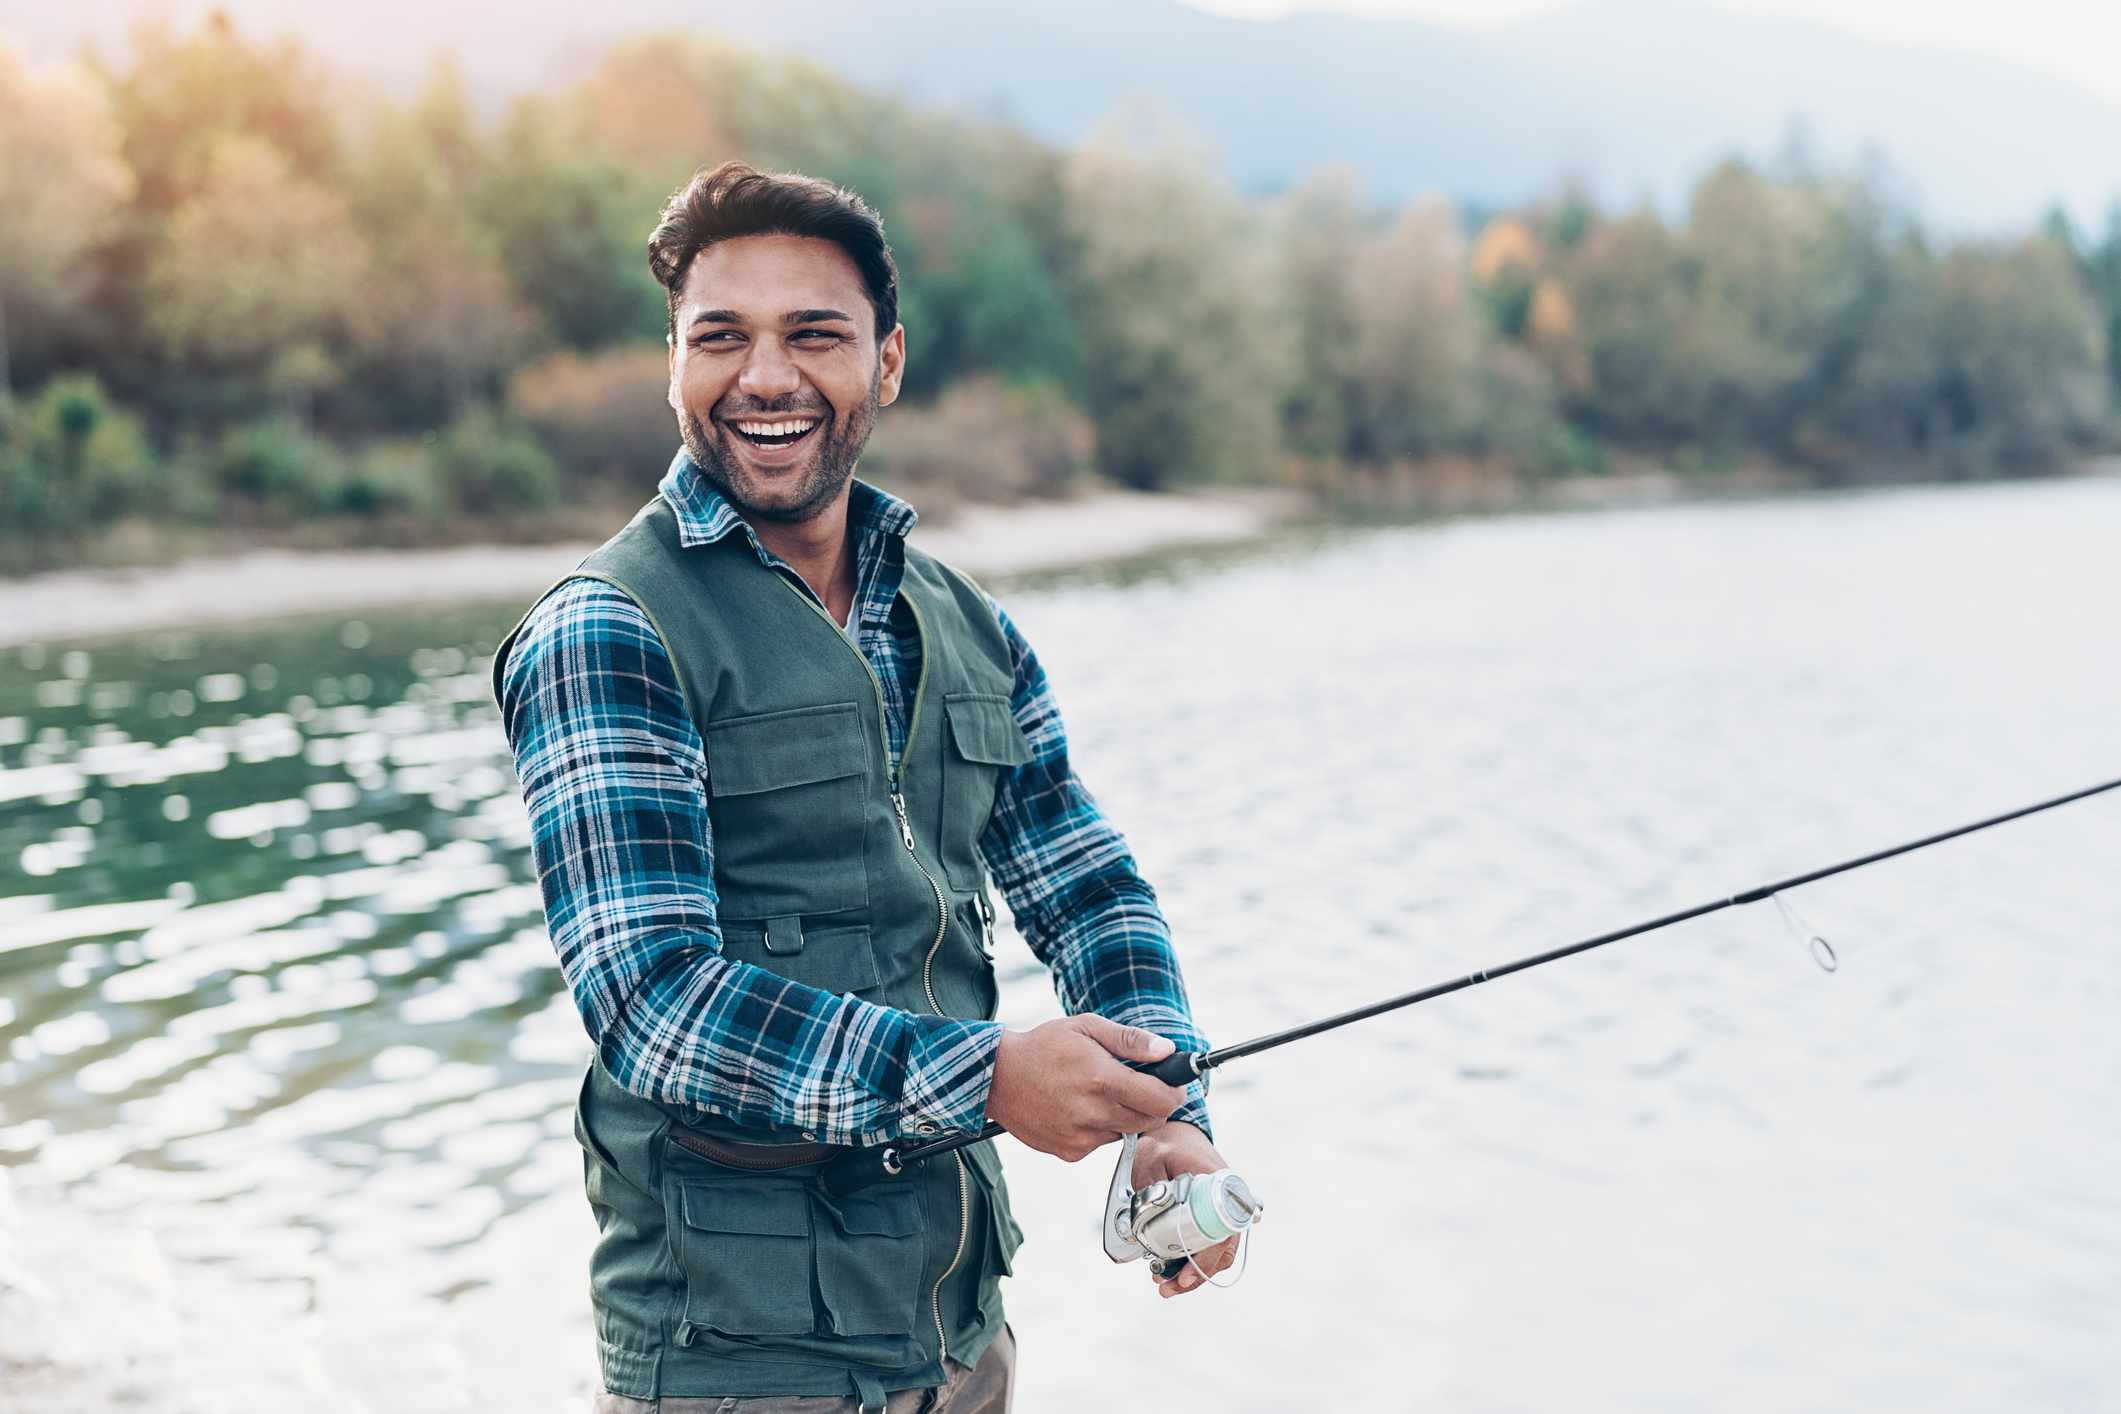 Man smiling and fishing